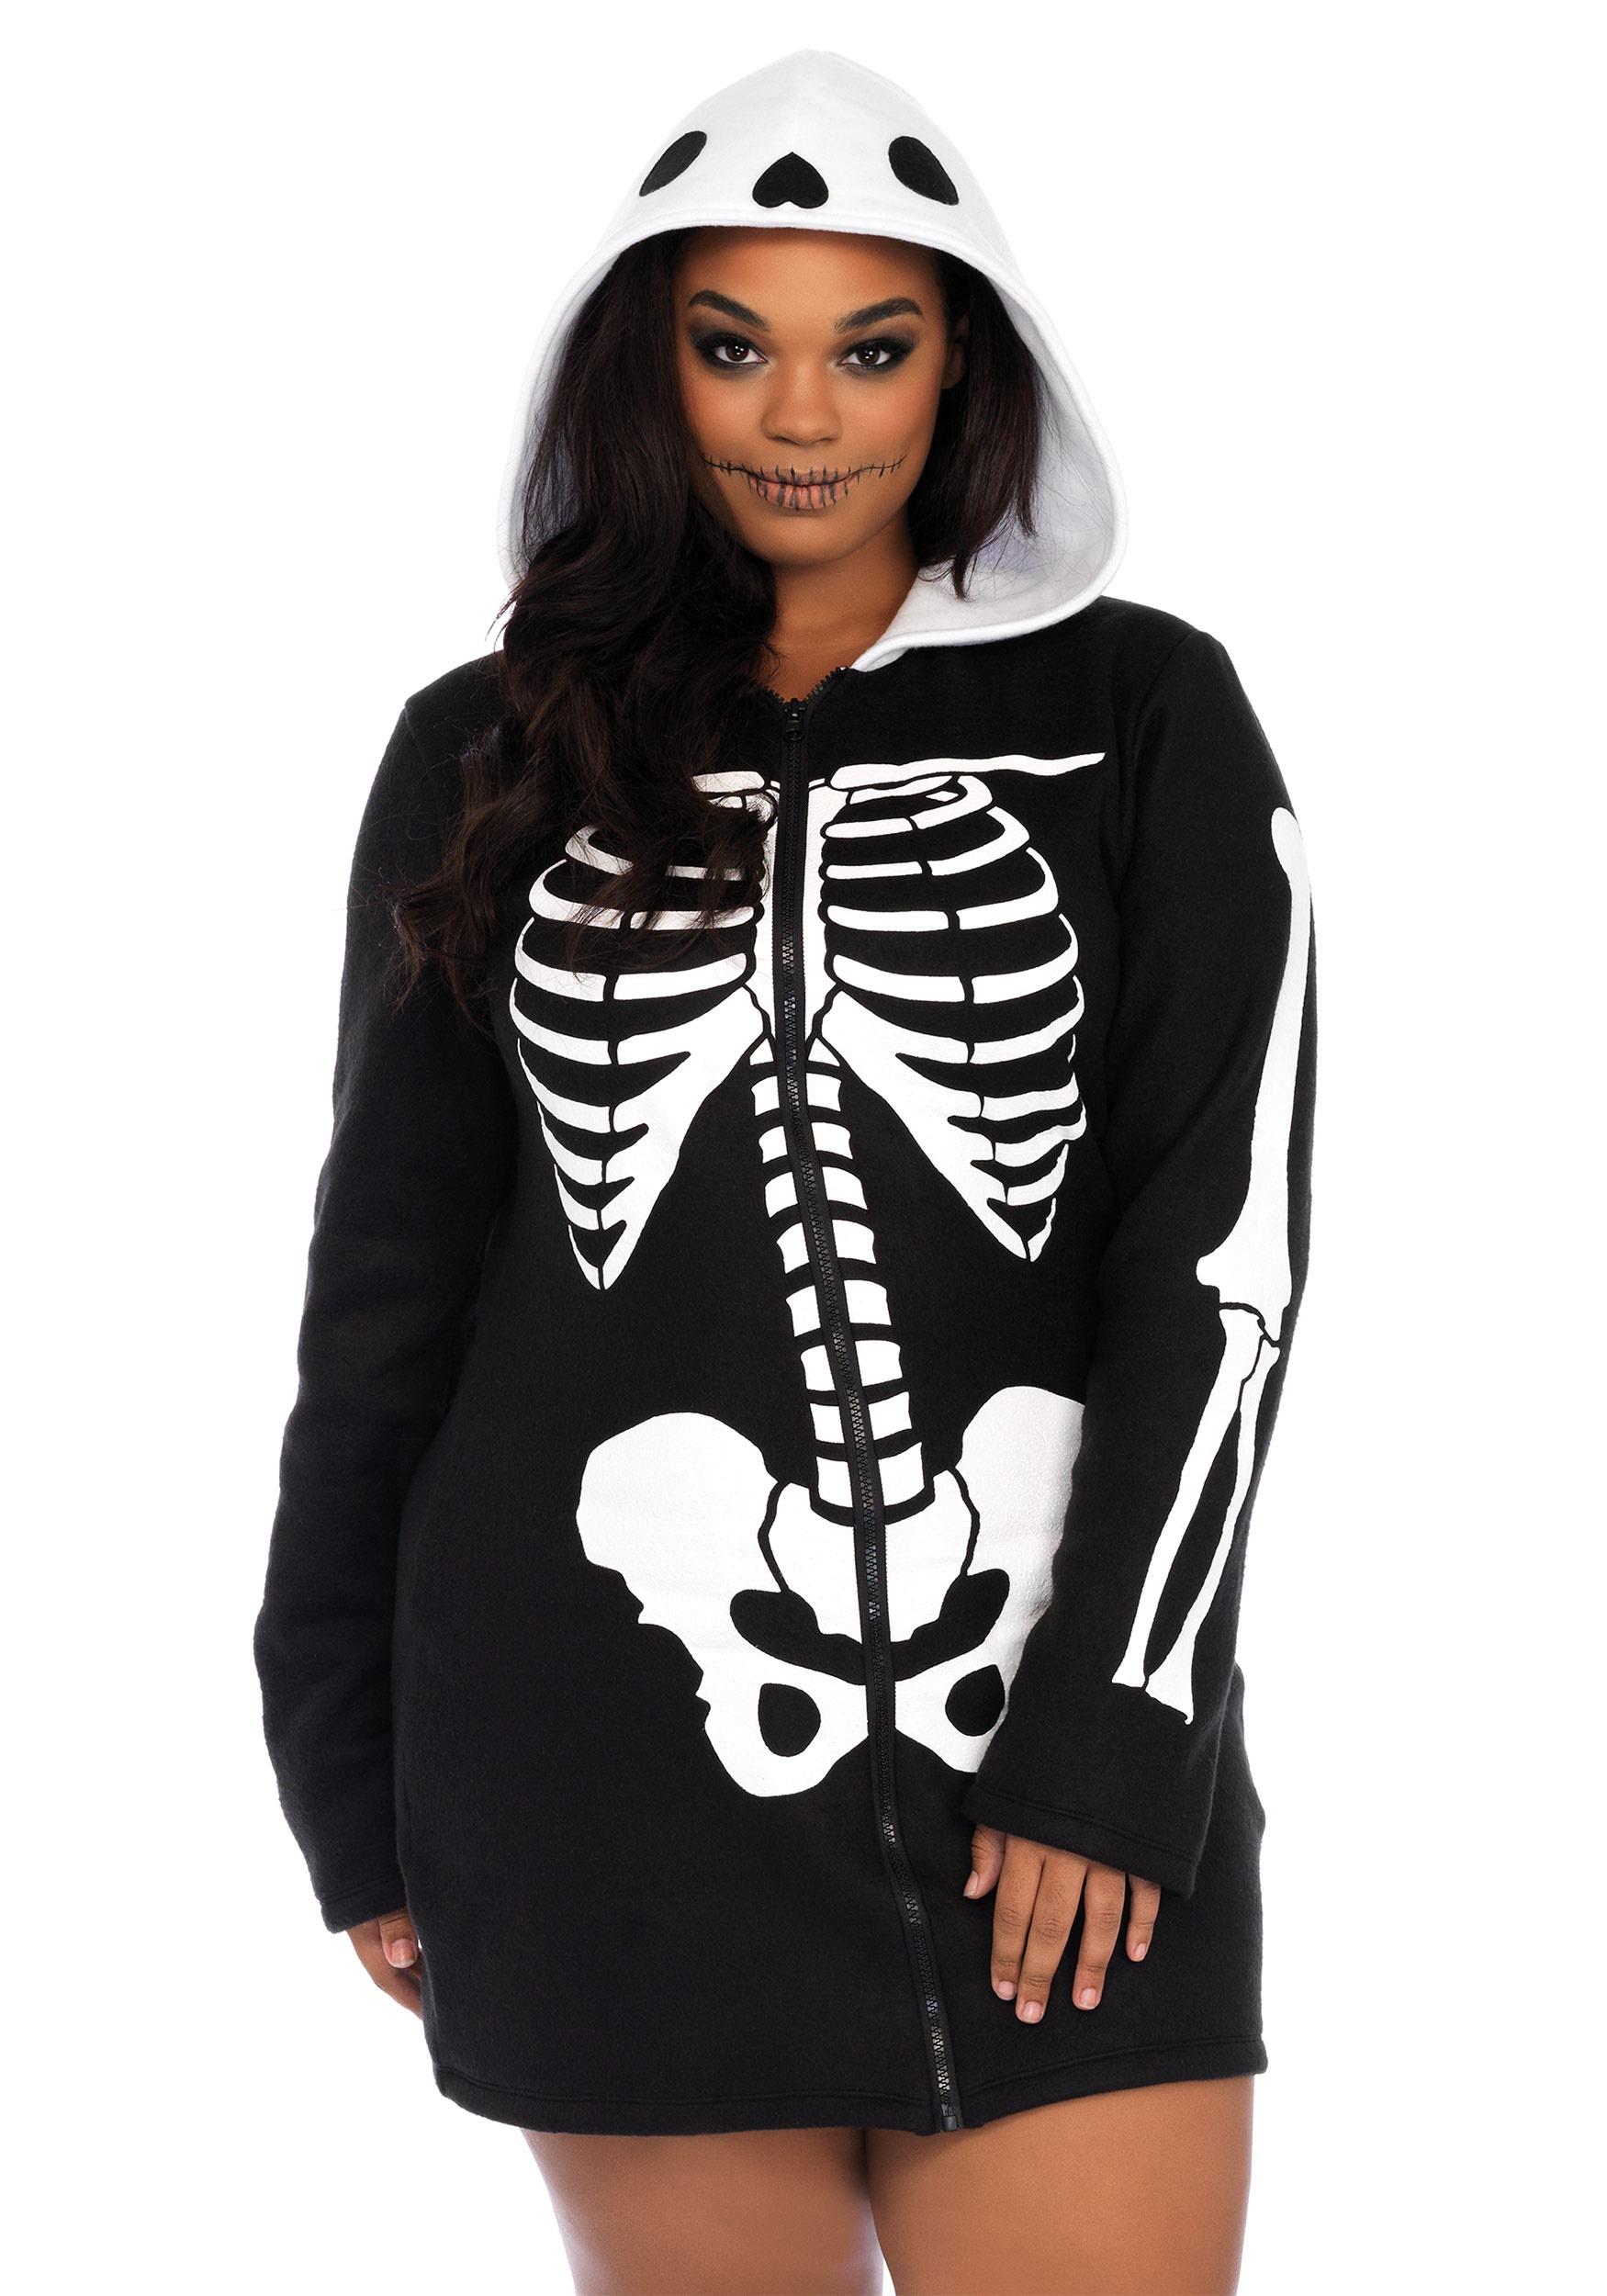 605bf17dc4b Women s Plus Size Cozy Skeleton Costume